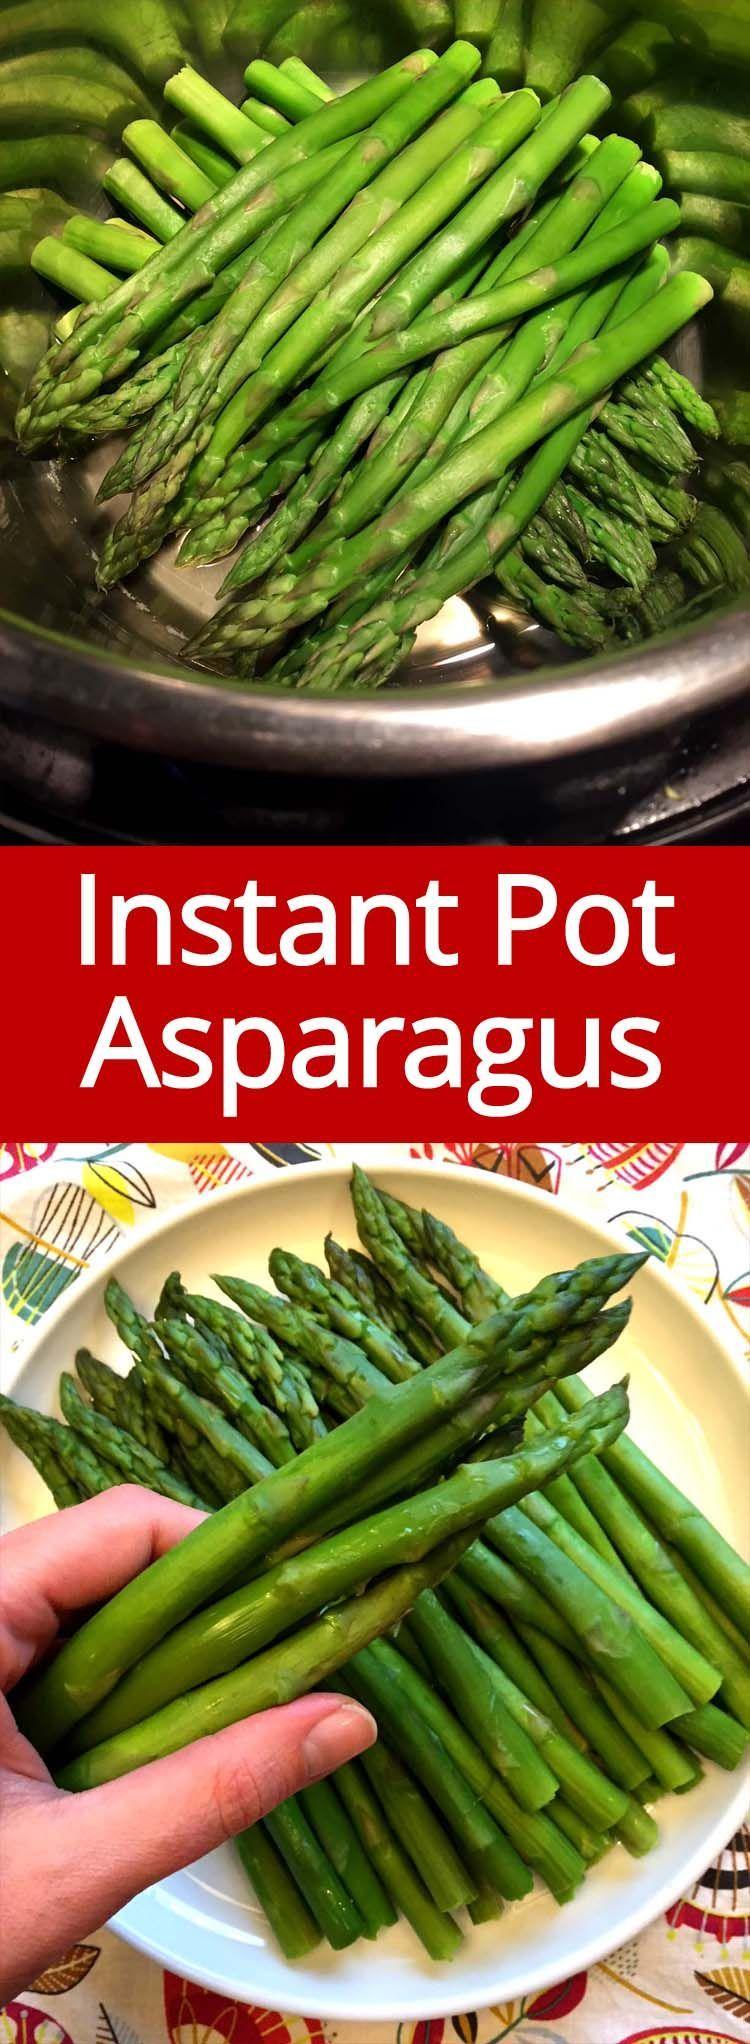 Photo of Instant Pot Asparagus – Pressure Cooker Steamed Asparagus Recipe